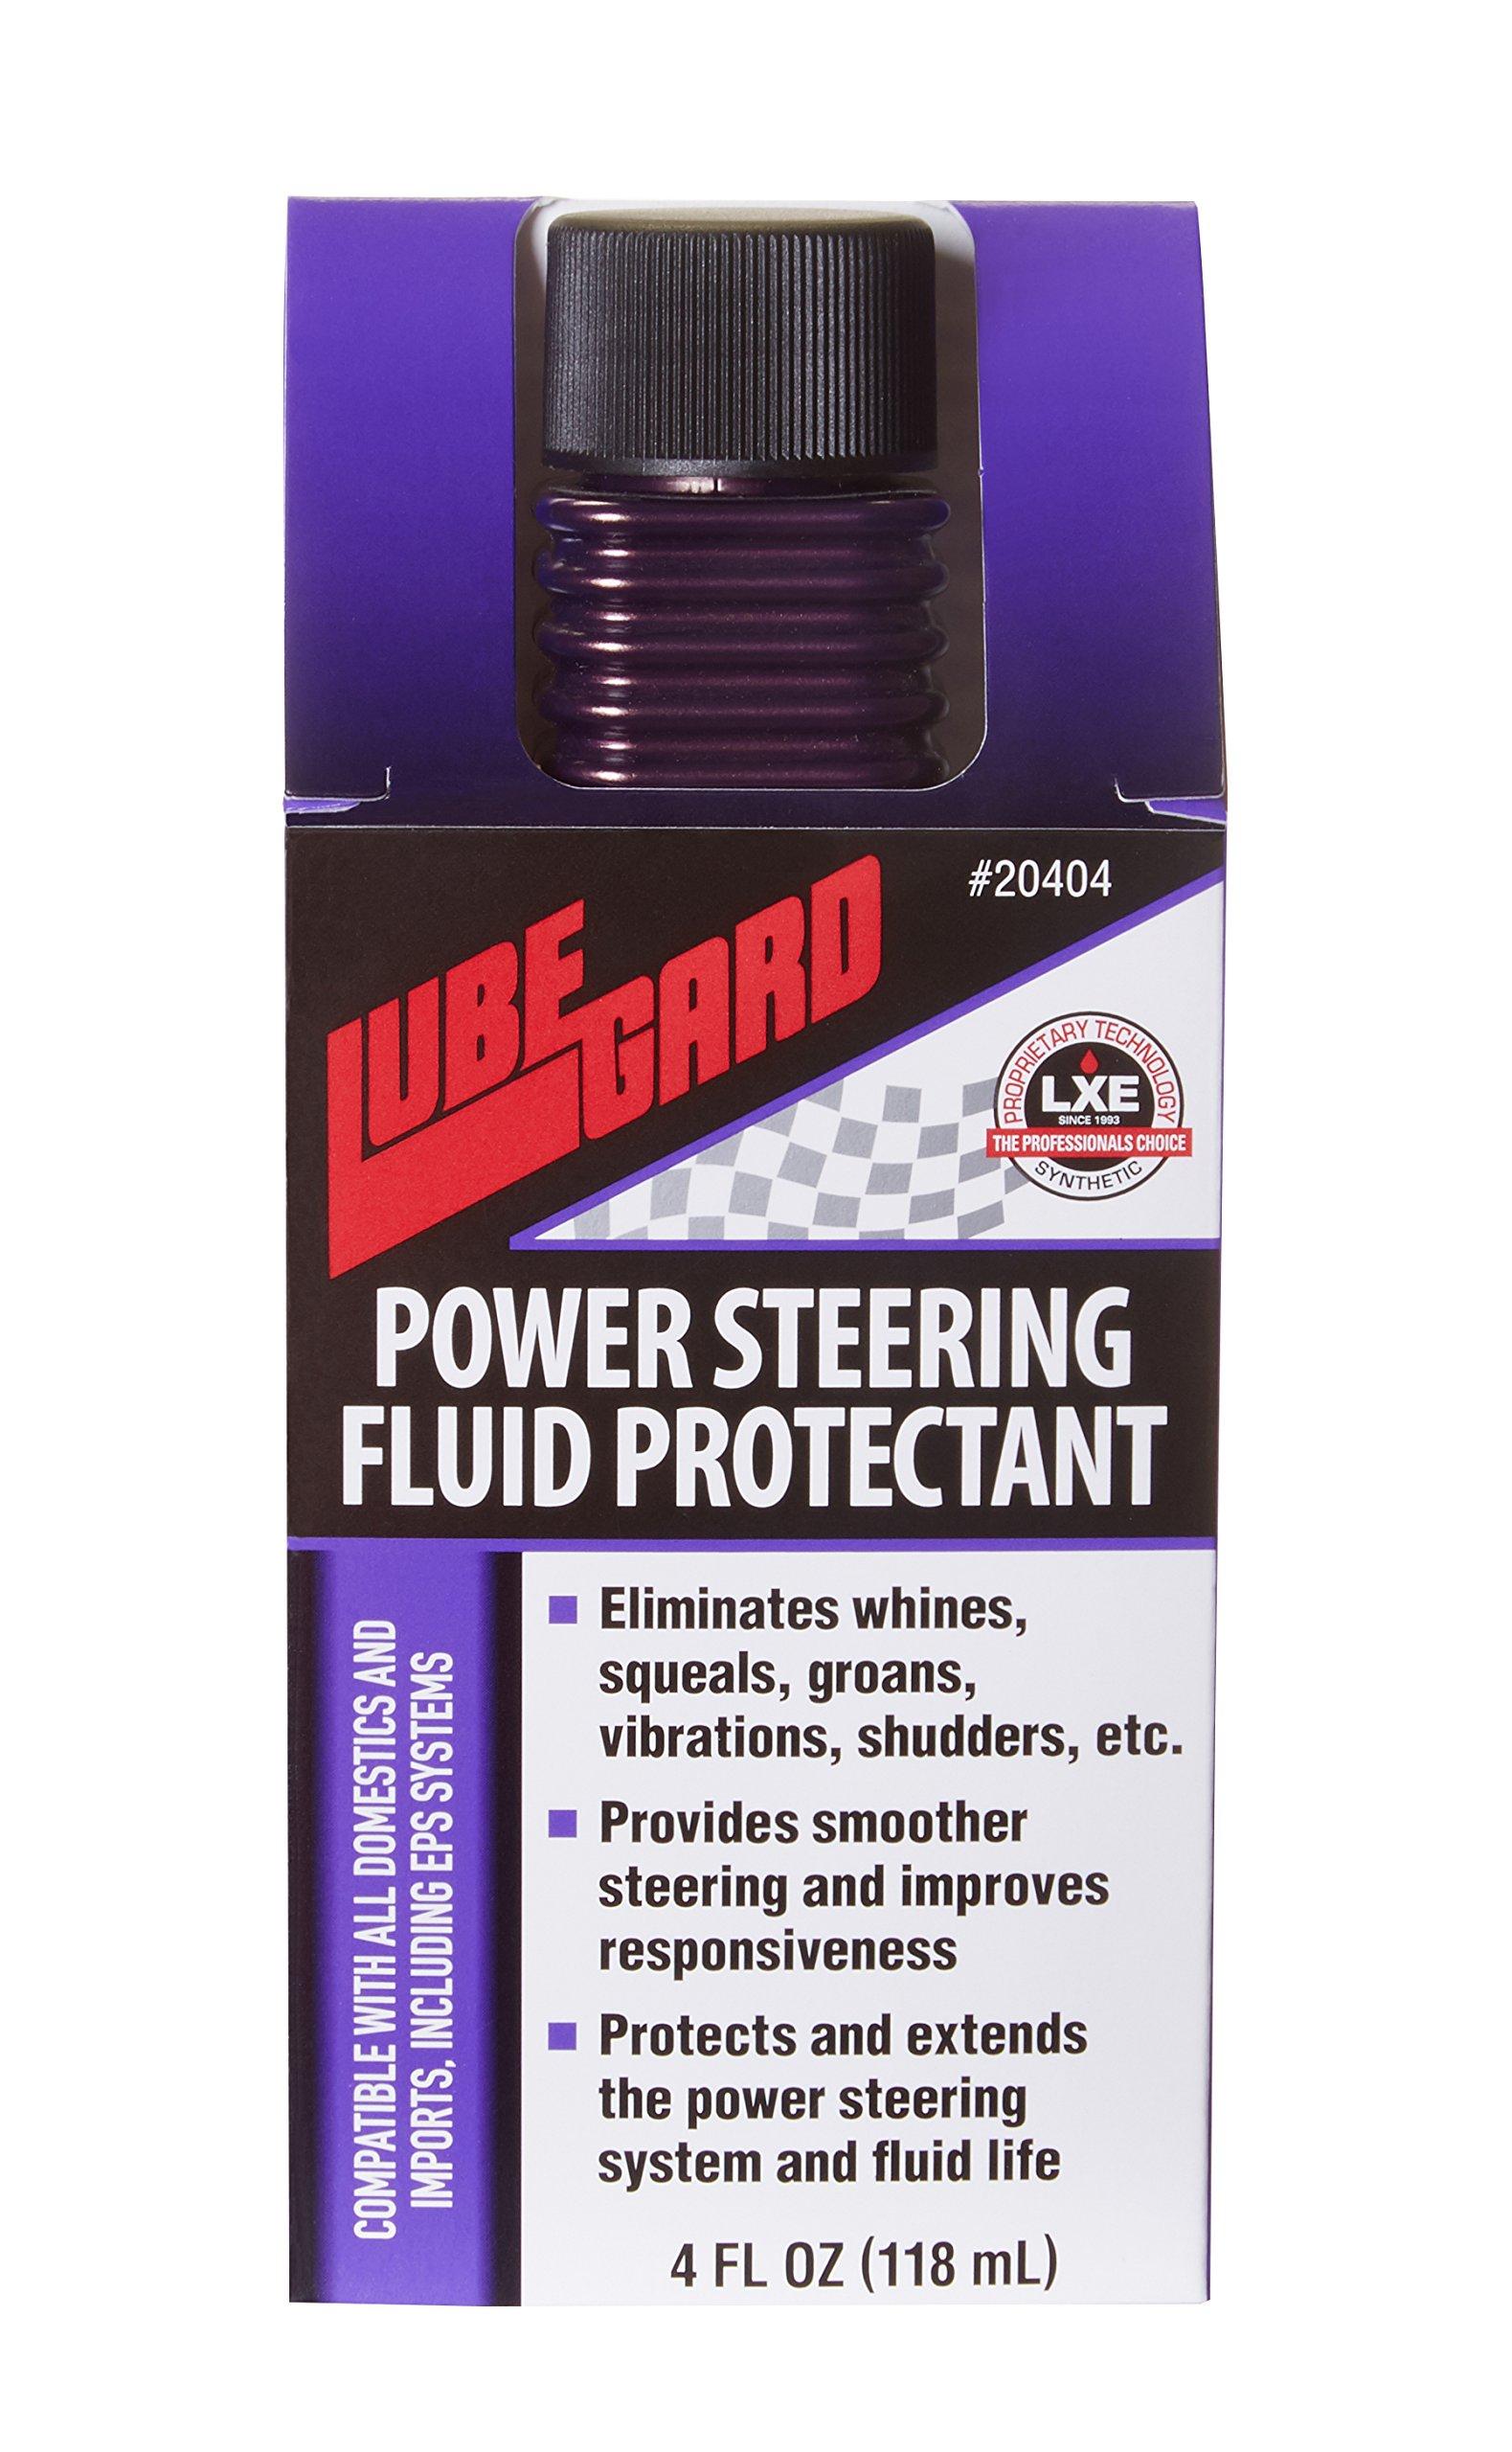 Lubegard 20404 Universal Power Steering Fluid Protectant, 4 fl. oz